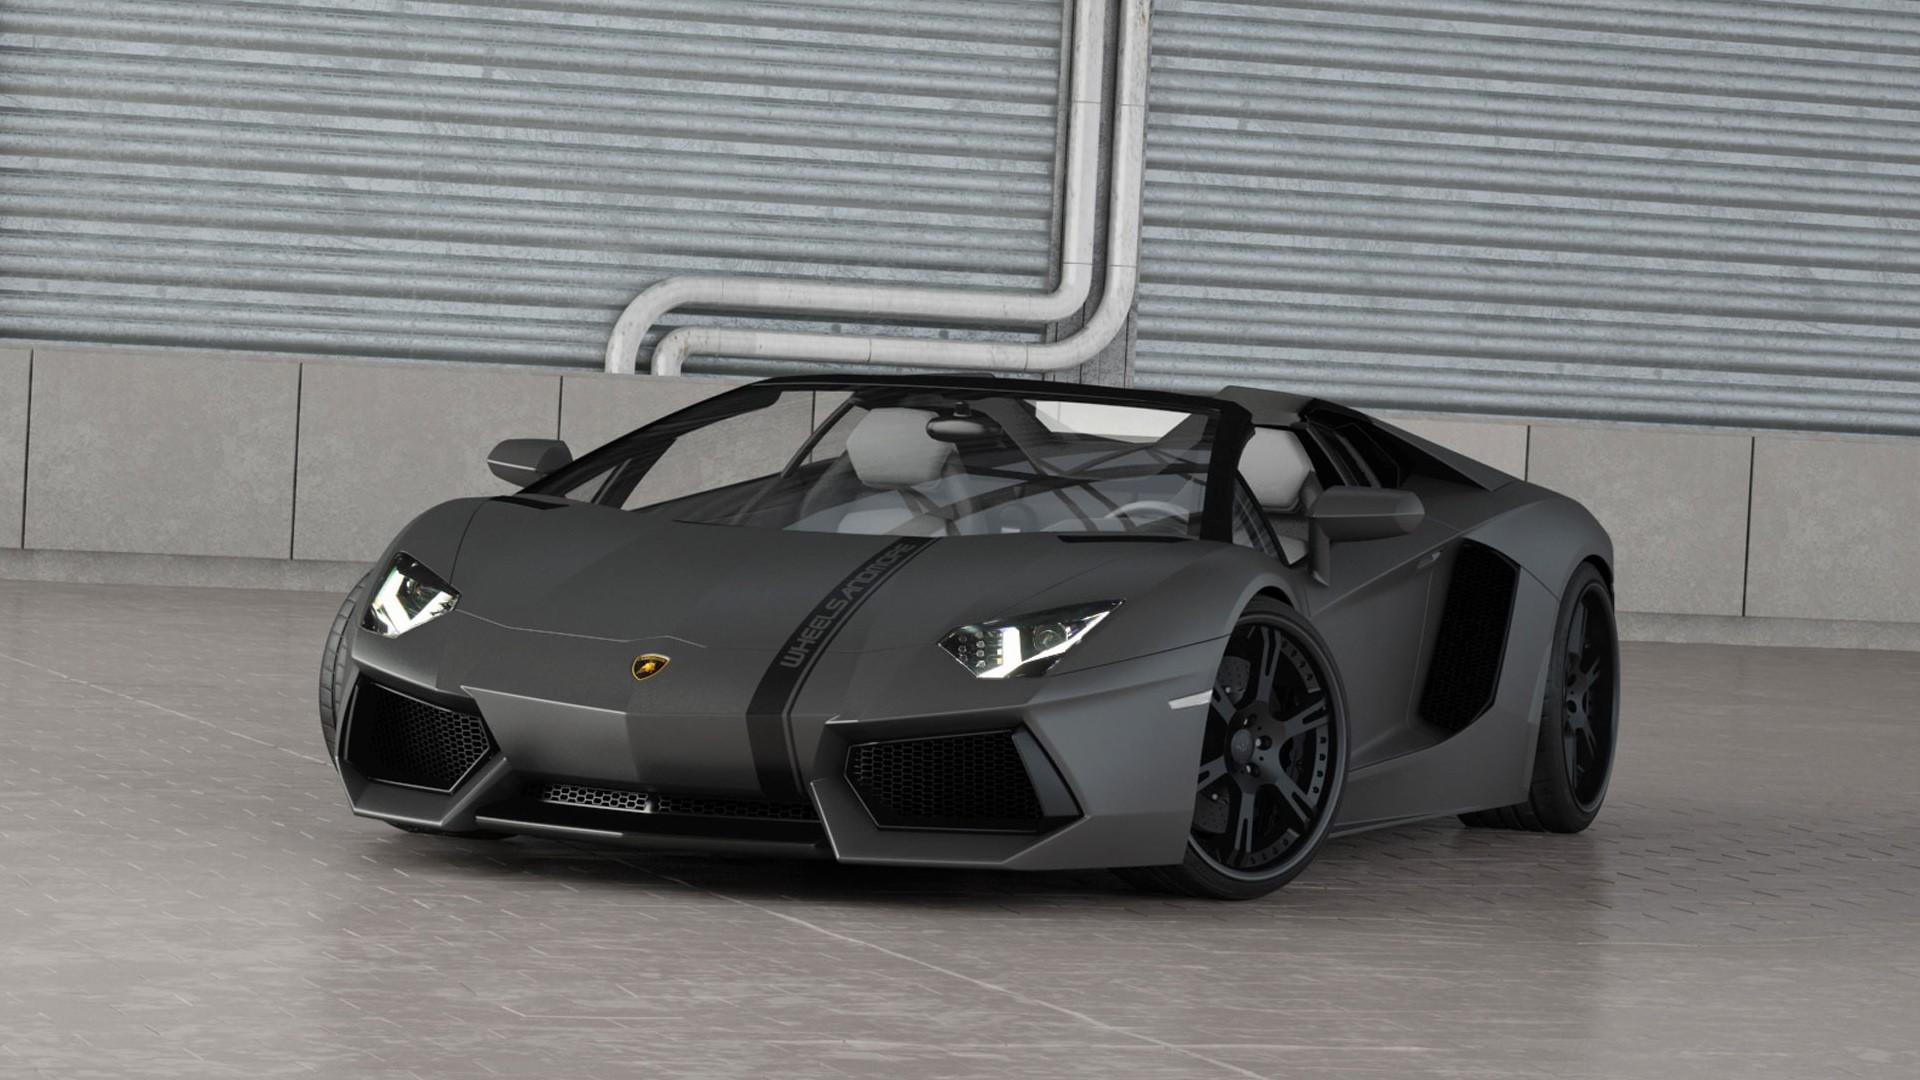 Lamborghini Aventador Lp 700 Wallpaper Hd Car Wallpapers Id 3443